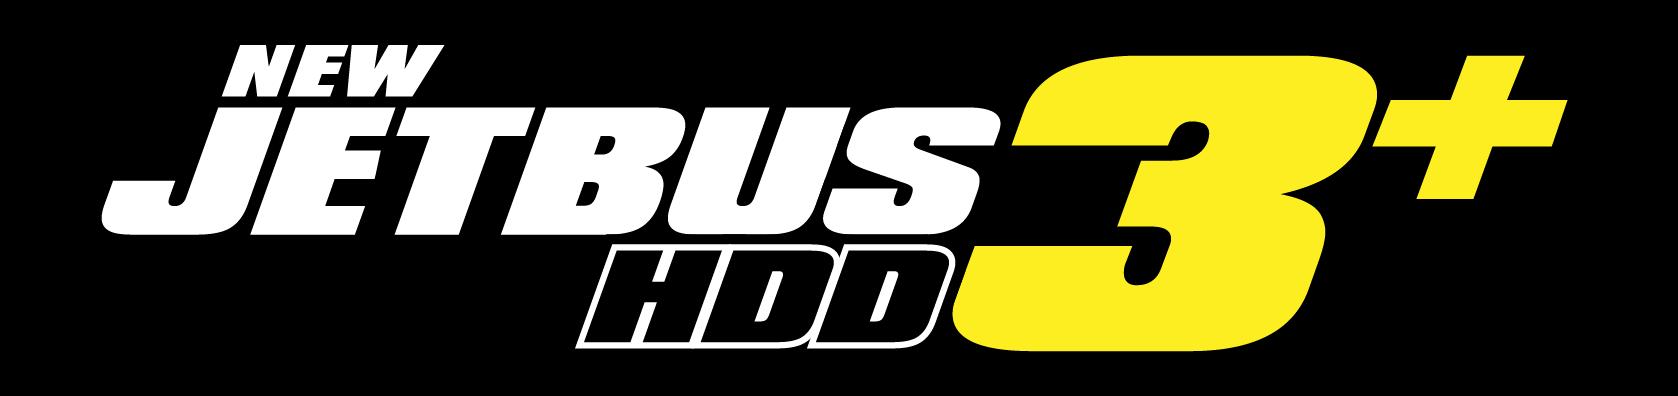 logo jetbus